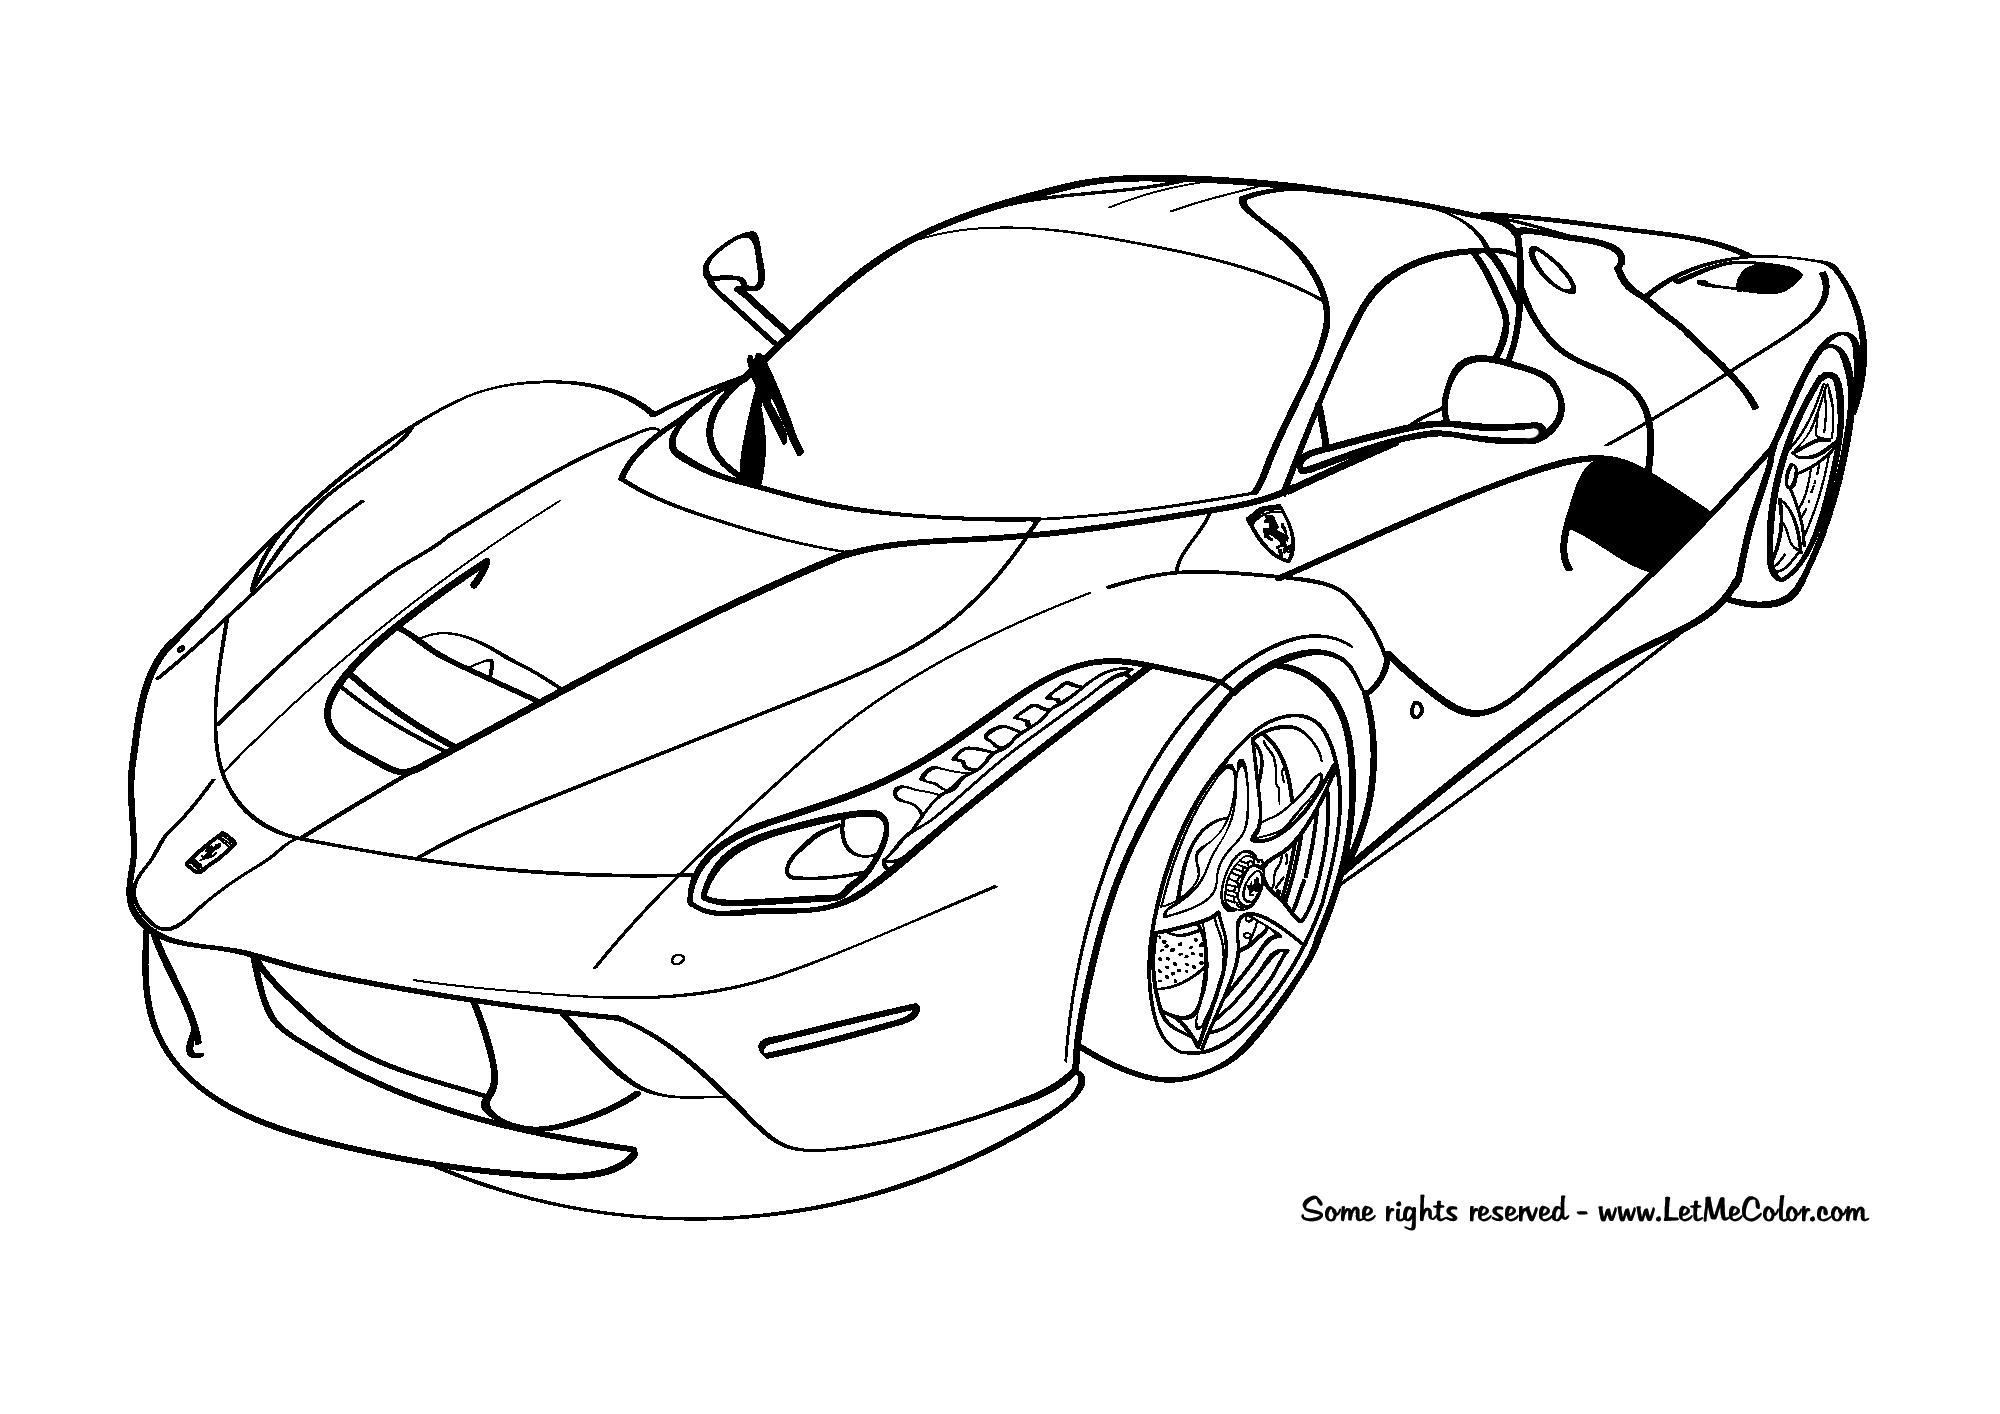 Ferrari Laferrari Coloring Page Letmecolor